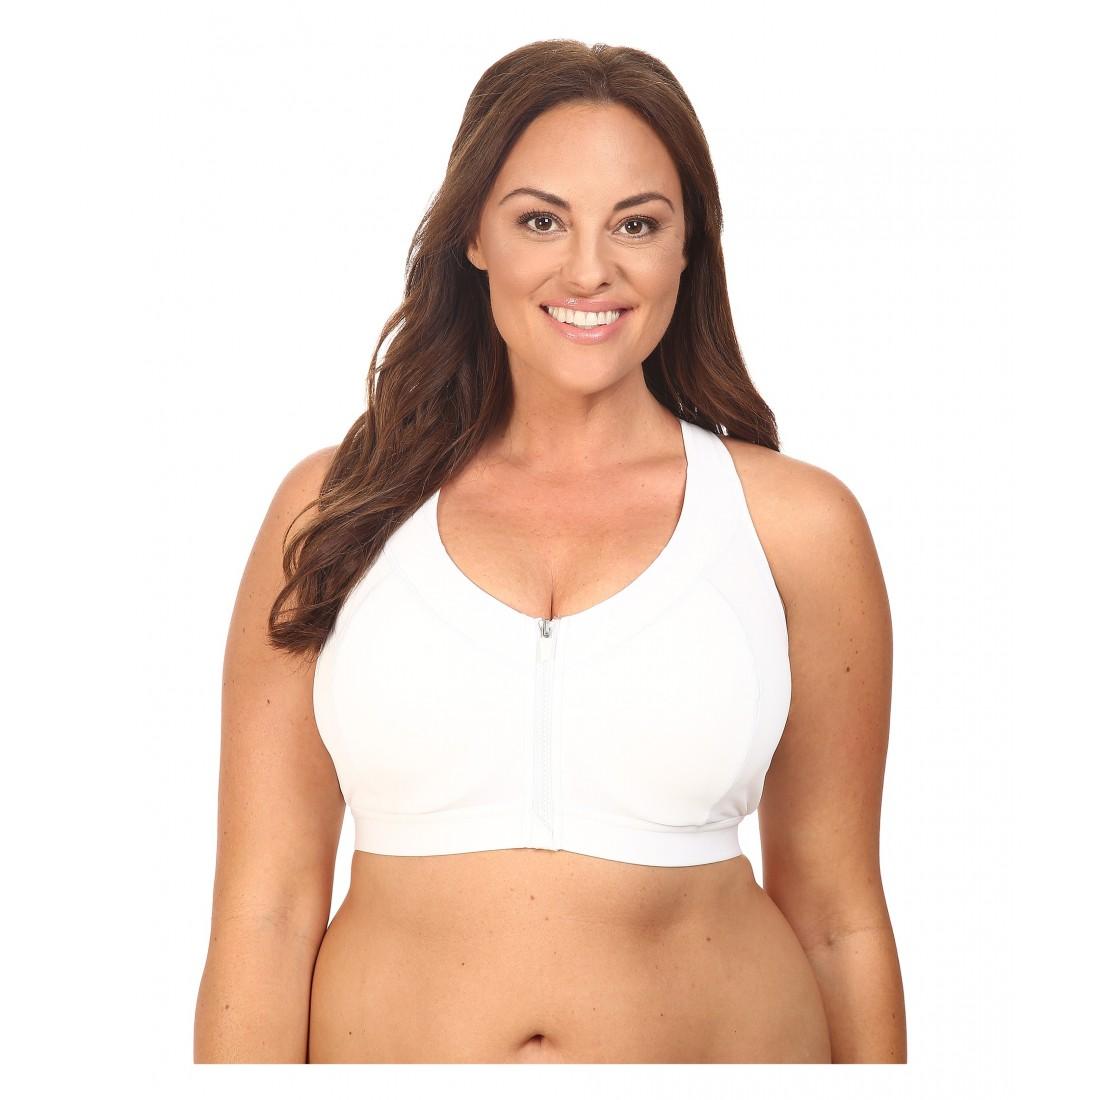 acebc41d7b9ed Marika Curves Plus Size Sierra Sports Bra 6PM8795492 White